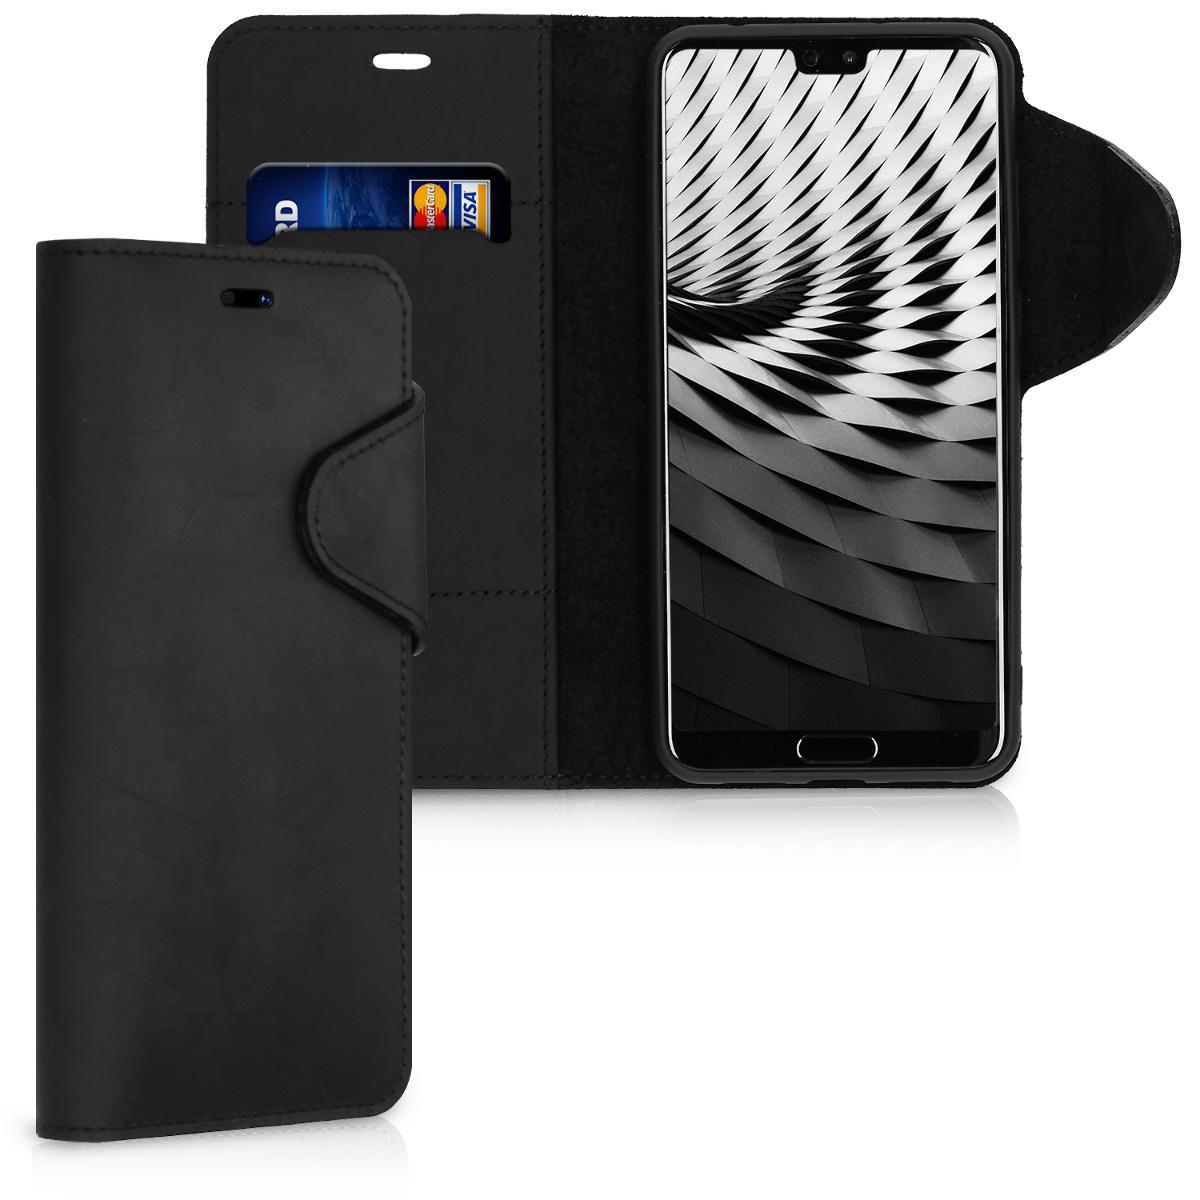 Kalibri Δερμάτινη Suede Θήκη - Πορτοφόλι Huawei P20 Pro -  Black (44897.01)